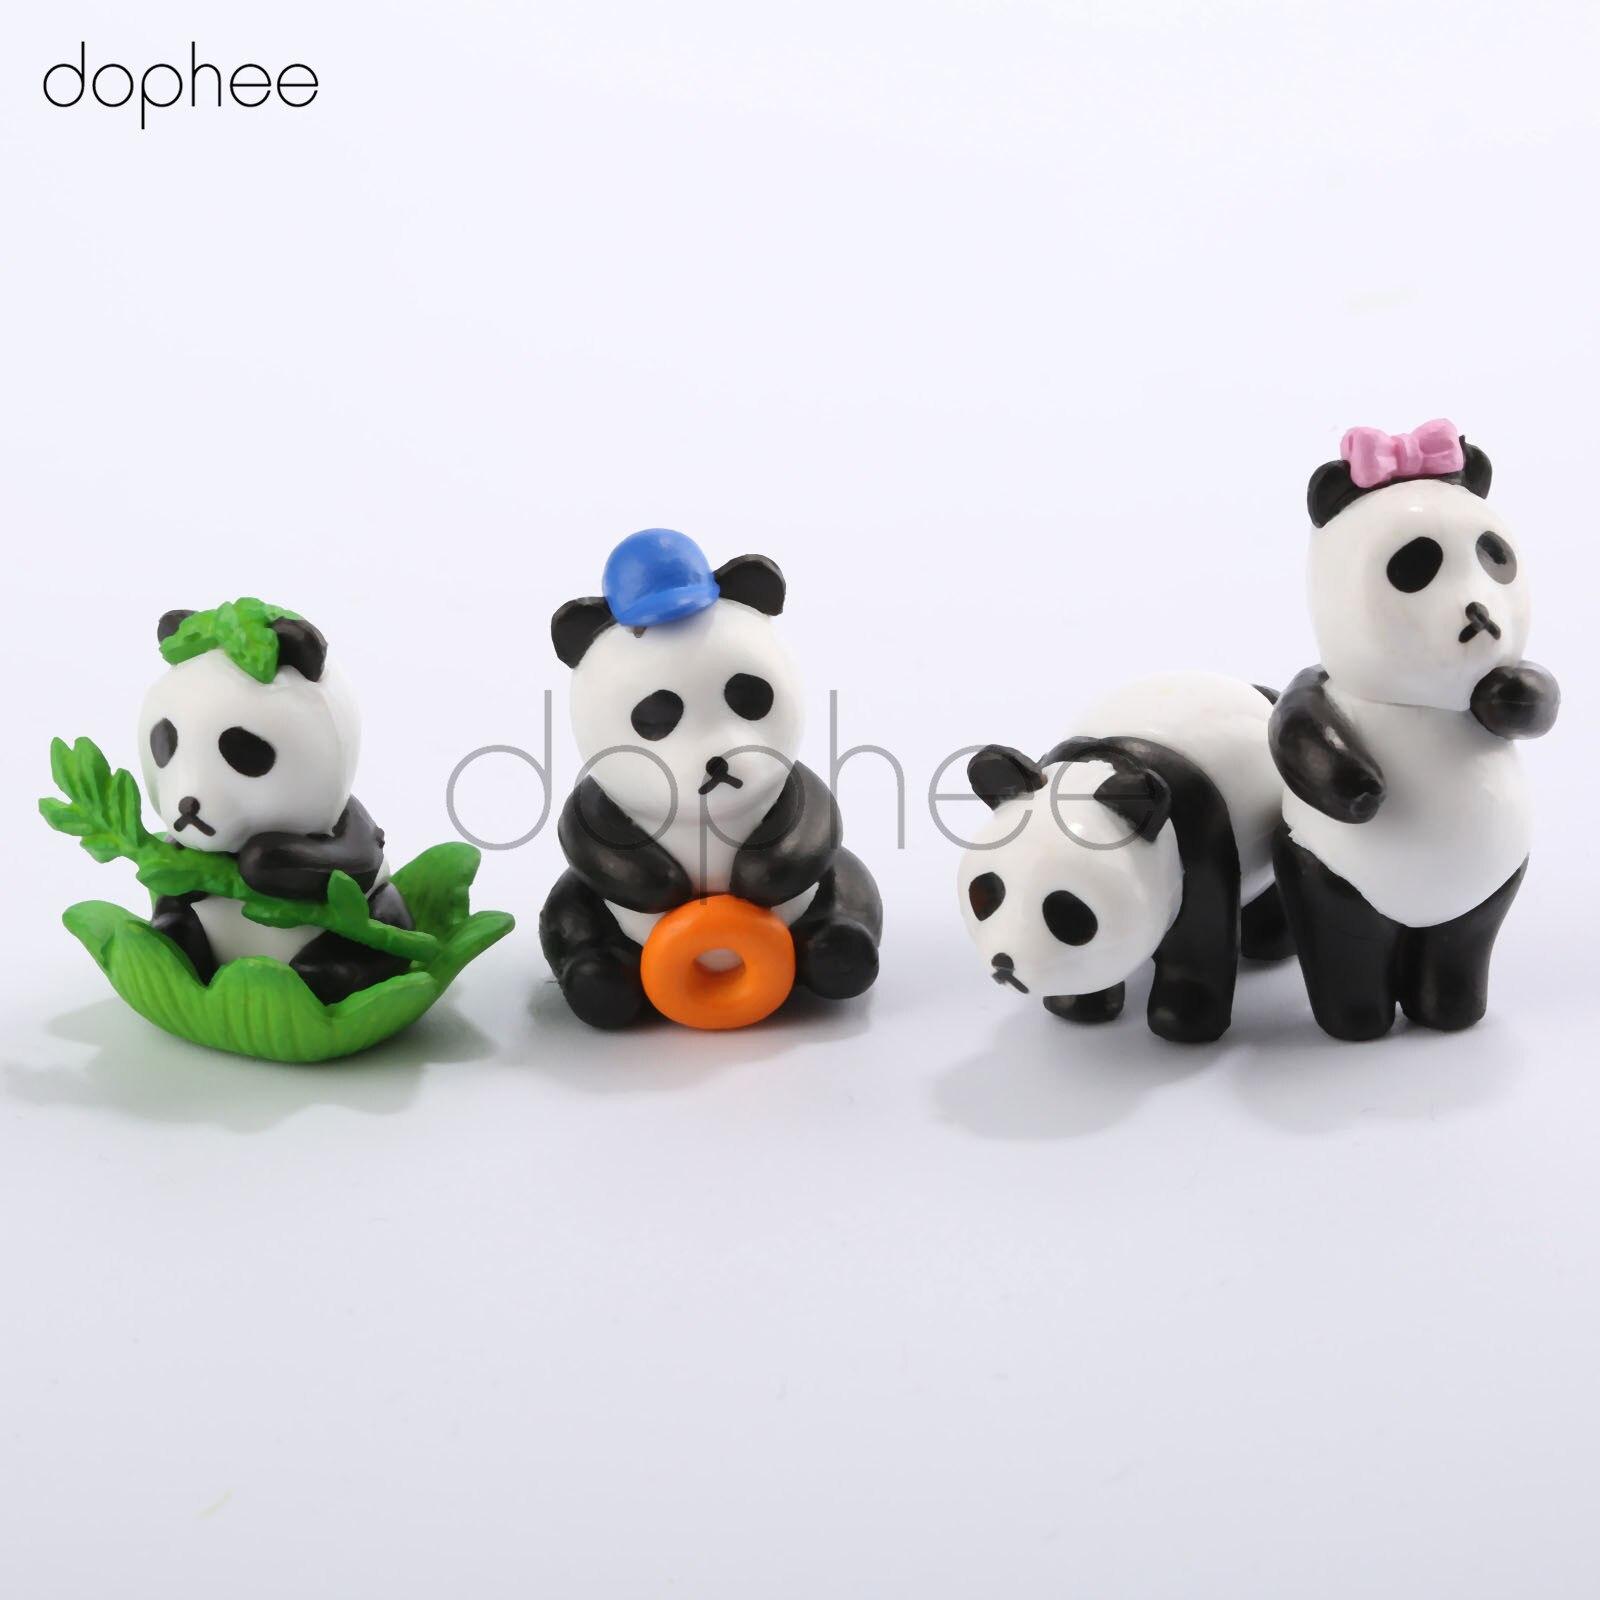 dophee 1pc Mini Cartoon Panda Figurine Resin Craft Miniature Garden Decor Resin cabochons terrarium accessories artesanato resin